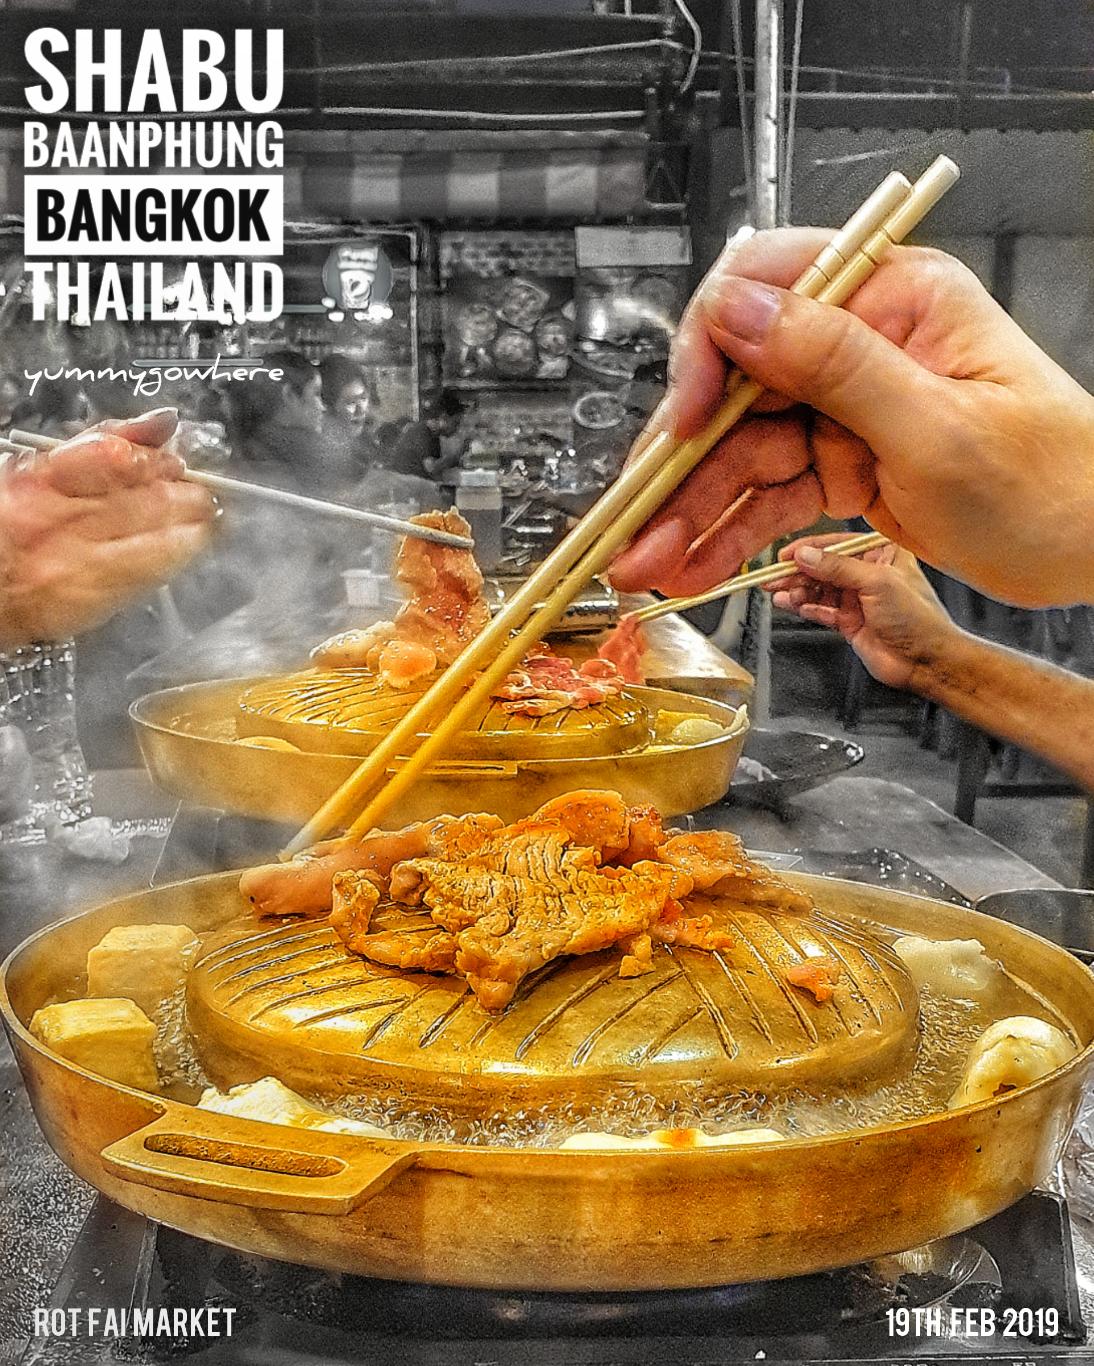 20190219_2033_Thailand_Bangkok_Rot Fai Market_Shabu Baanphung_Sansung N9_4.5_@_w